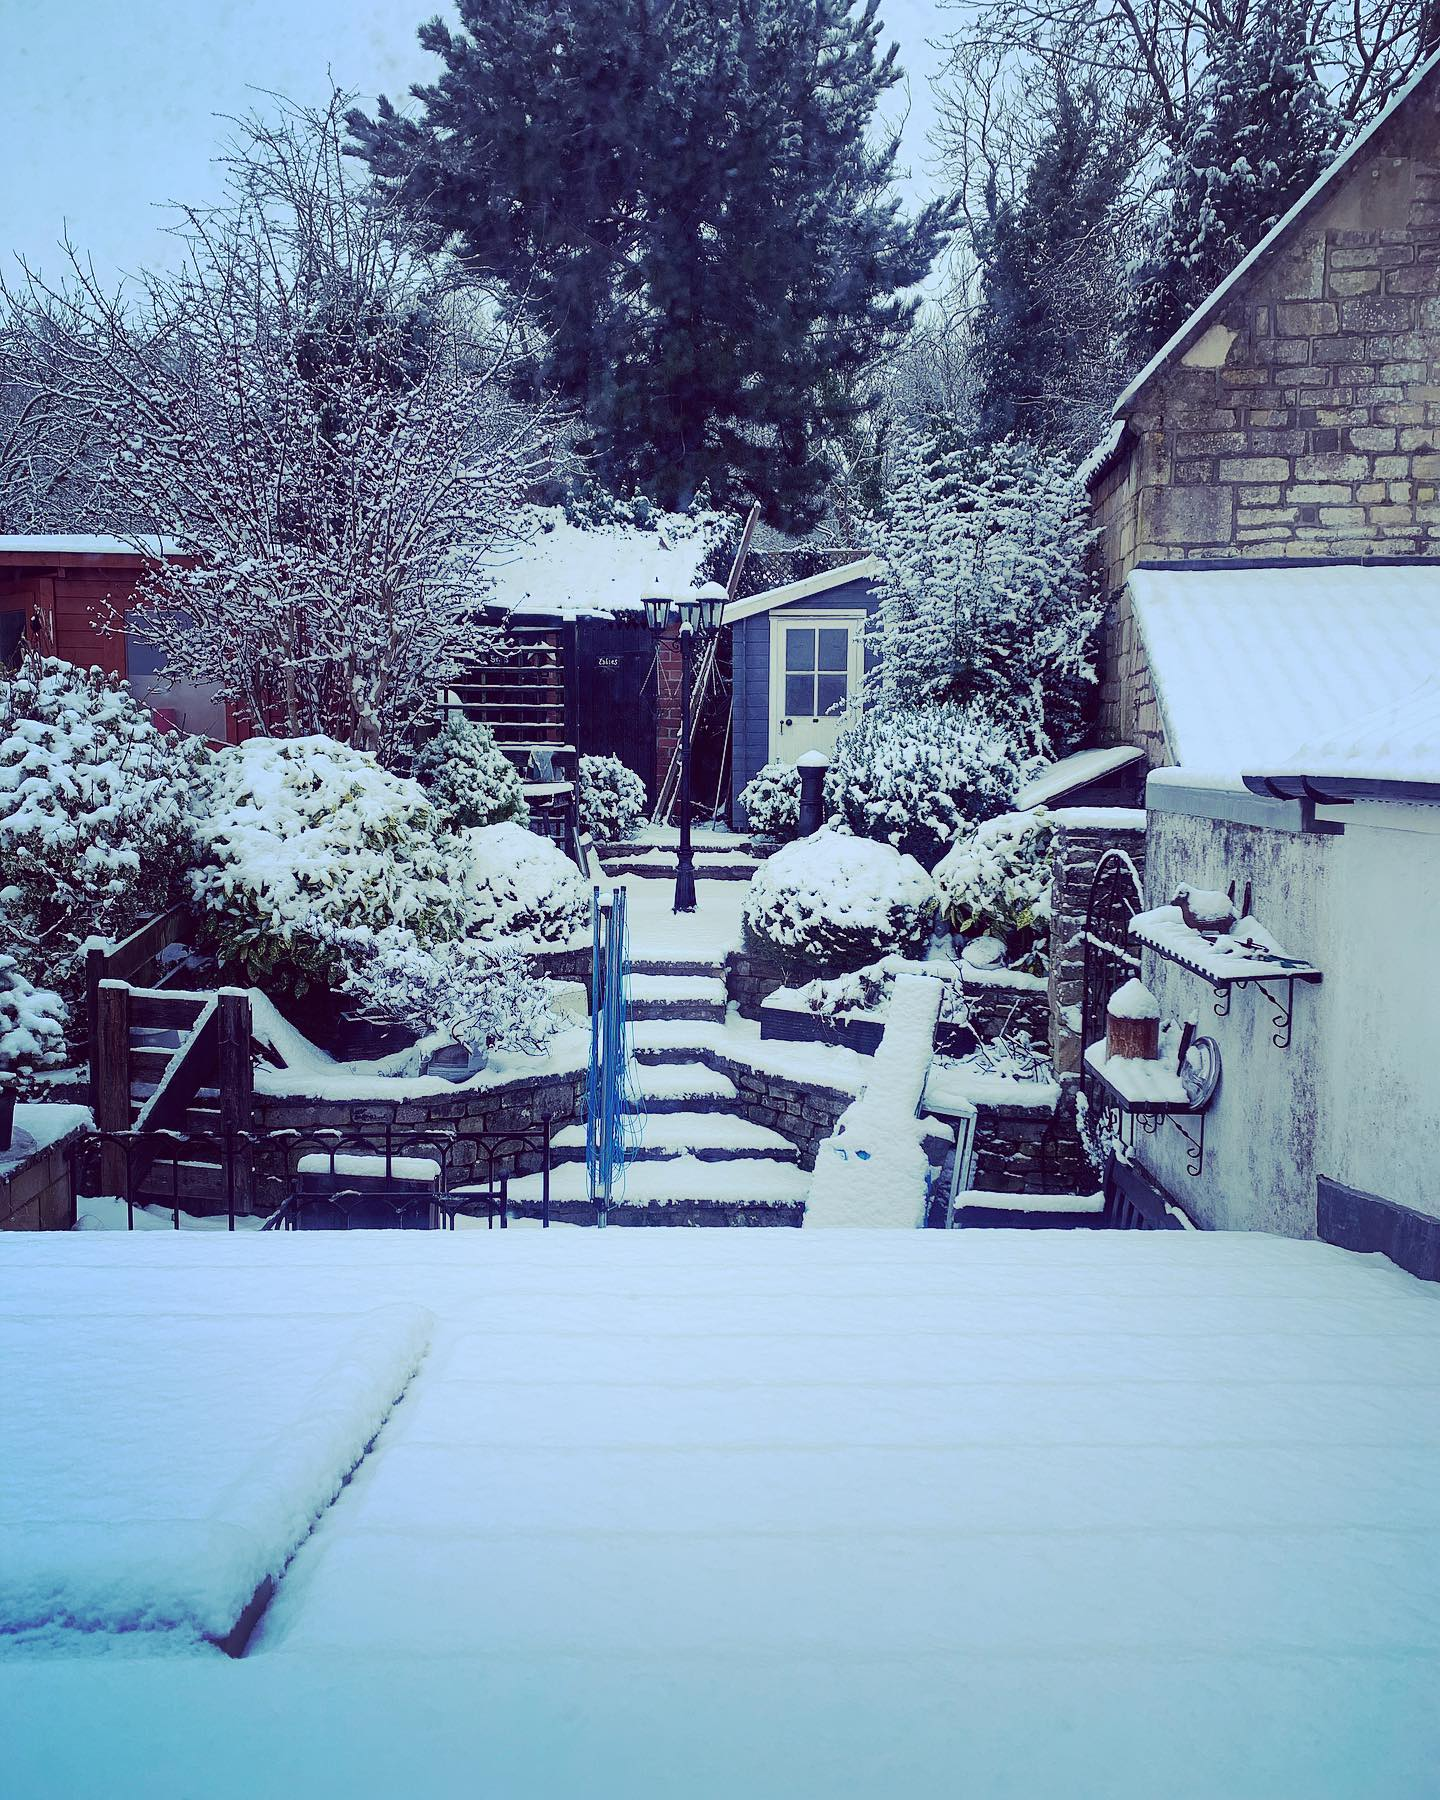 SNOW DAY! ️ ...#snowyay #brrrrr #dayoff #crispandwhite #wintertime #doyouwanttobuildasnowman